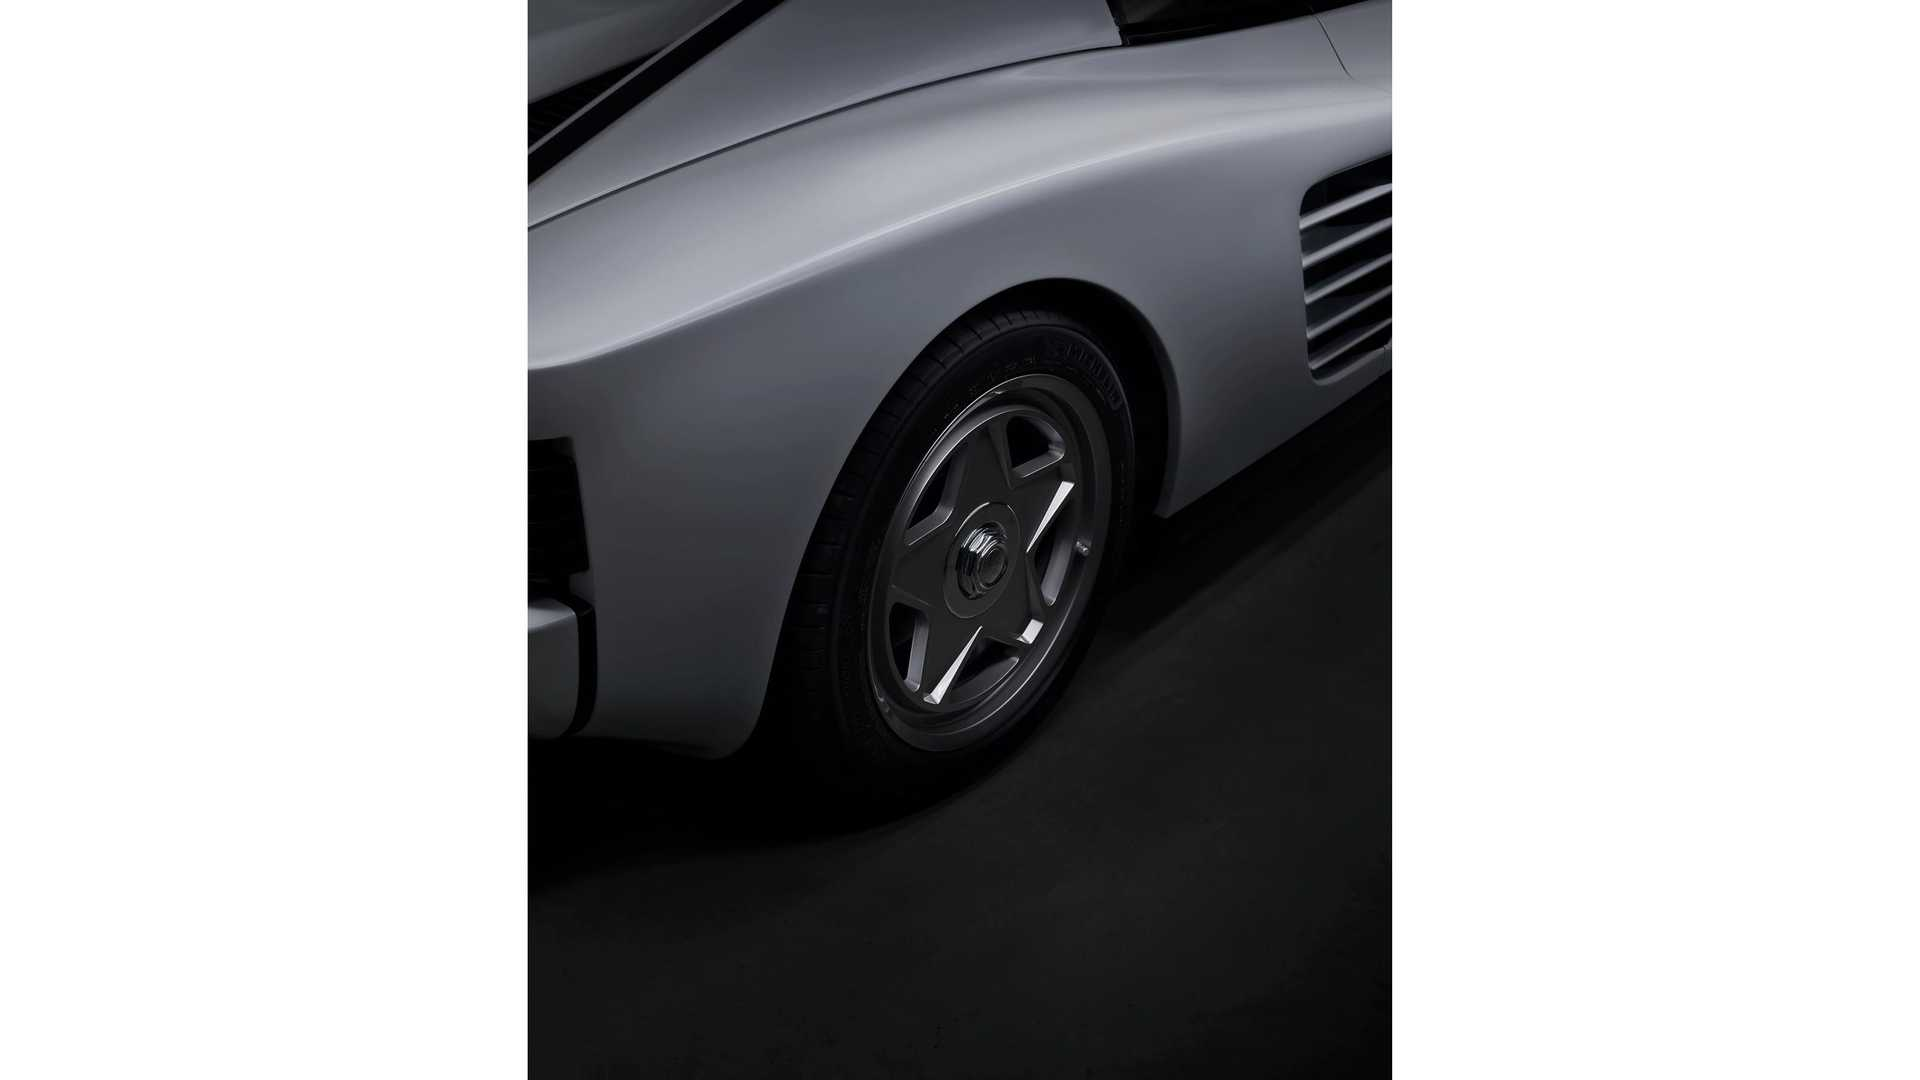 Ferrari-Testarossa-restomod-Officine-Fioravanti-12